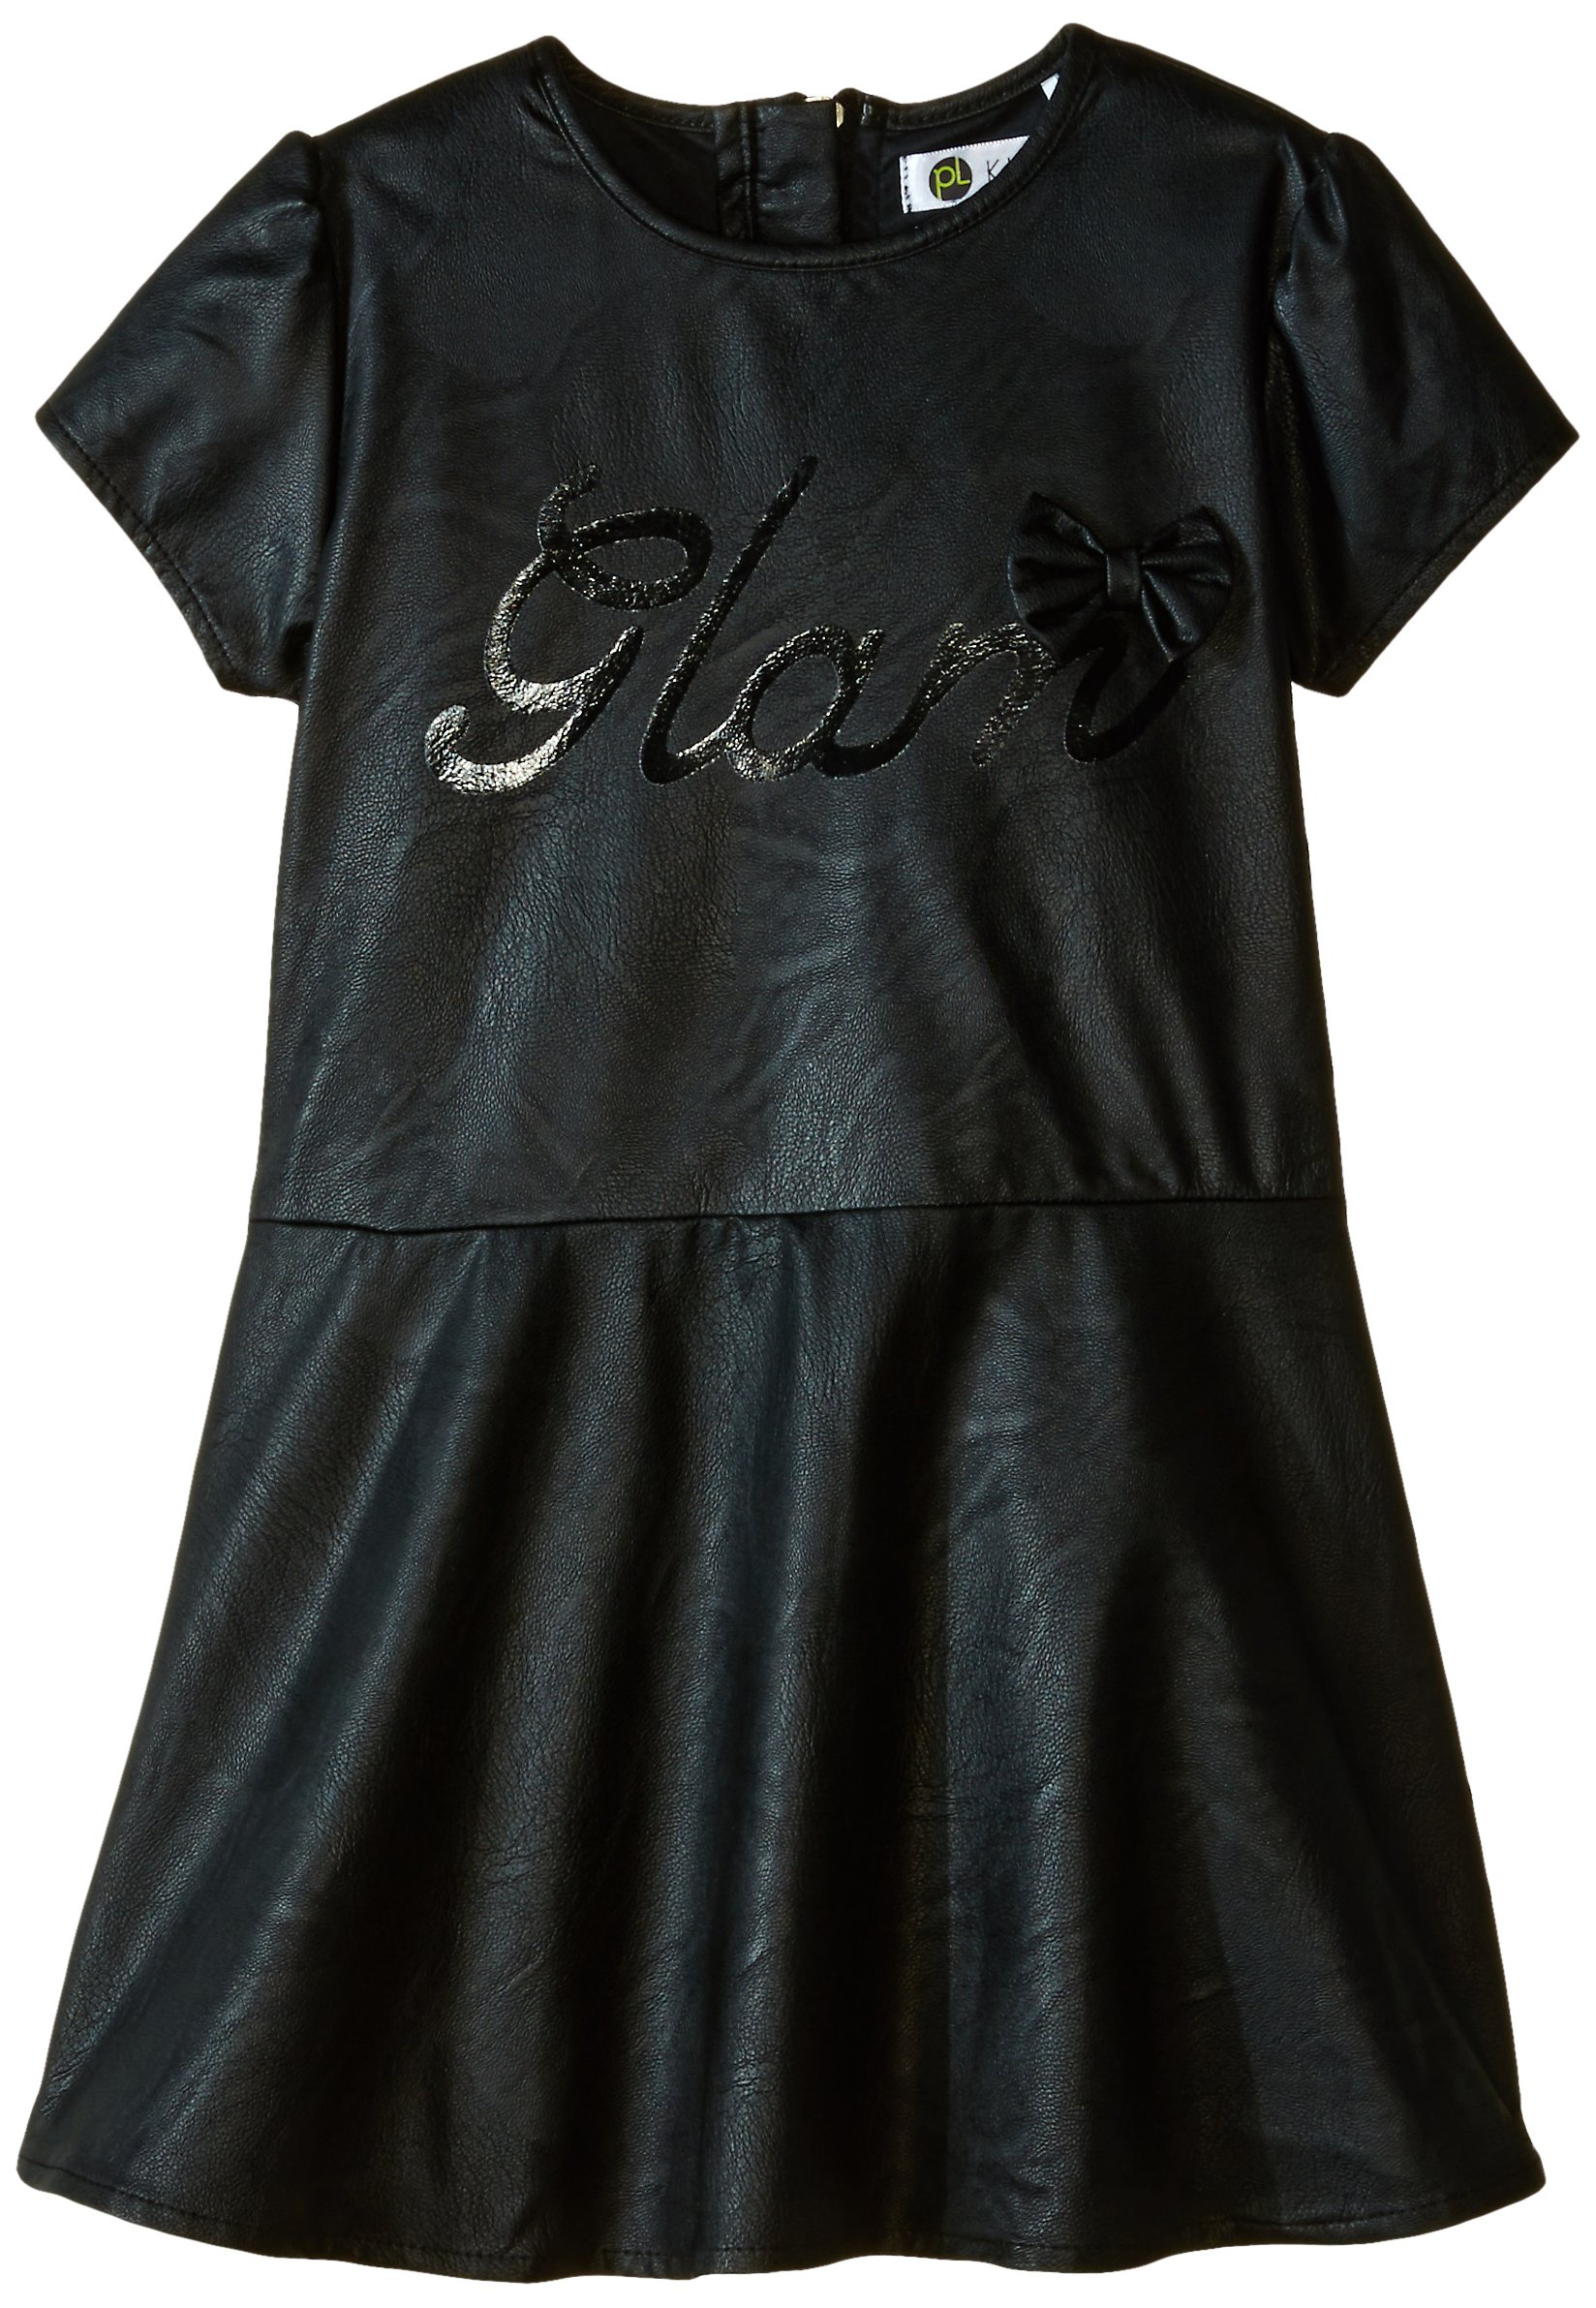 Petit Lem Little Girls' Glam Rock Short Sleeve Dress, Black, 6